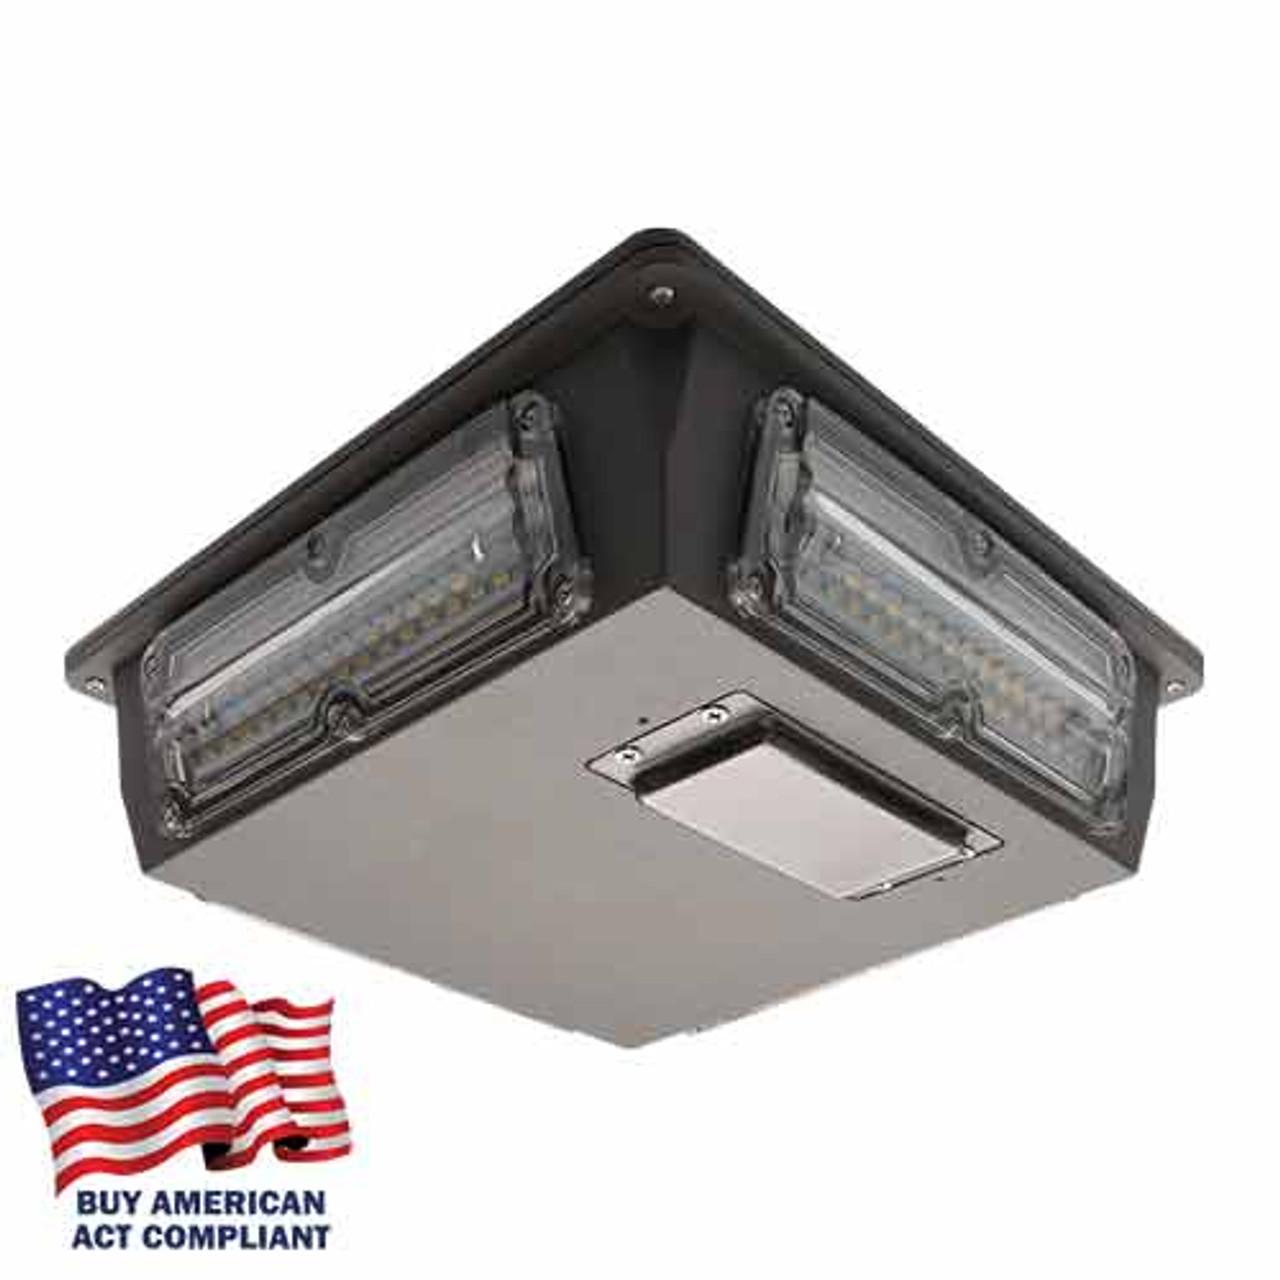 40 Watt LED Parking Garage Light Buy America Act